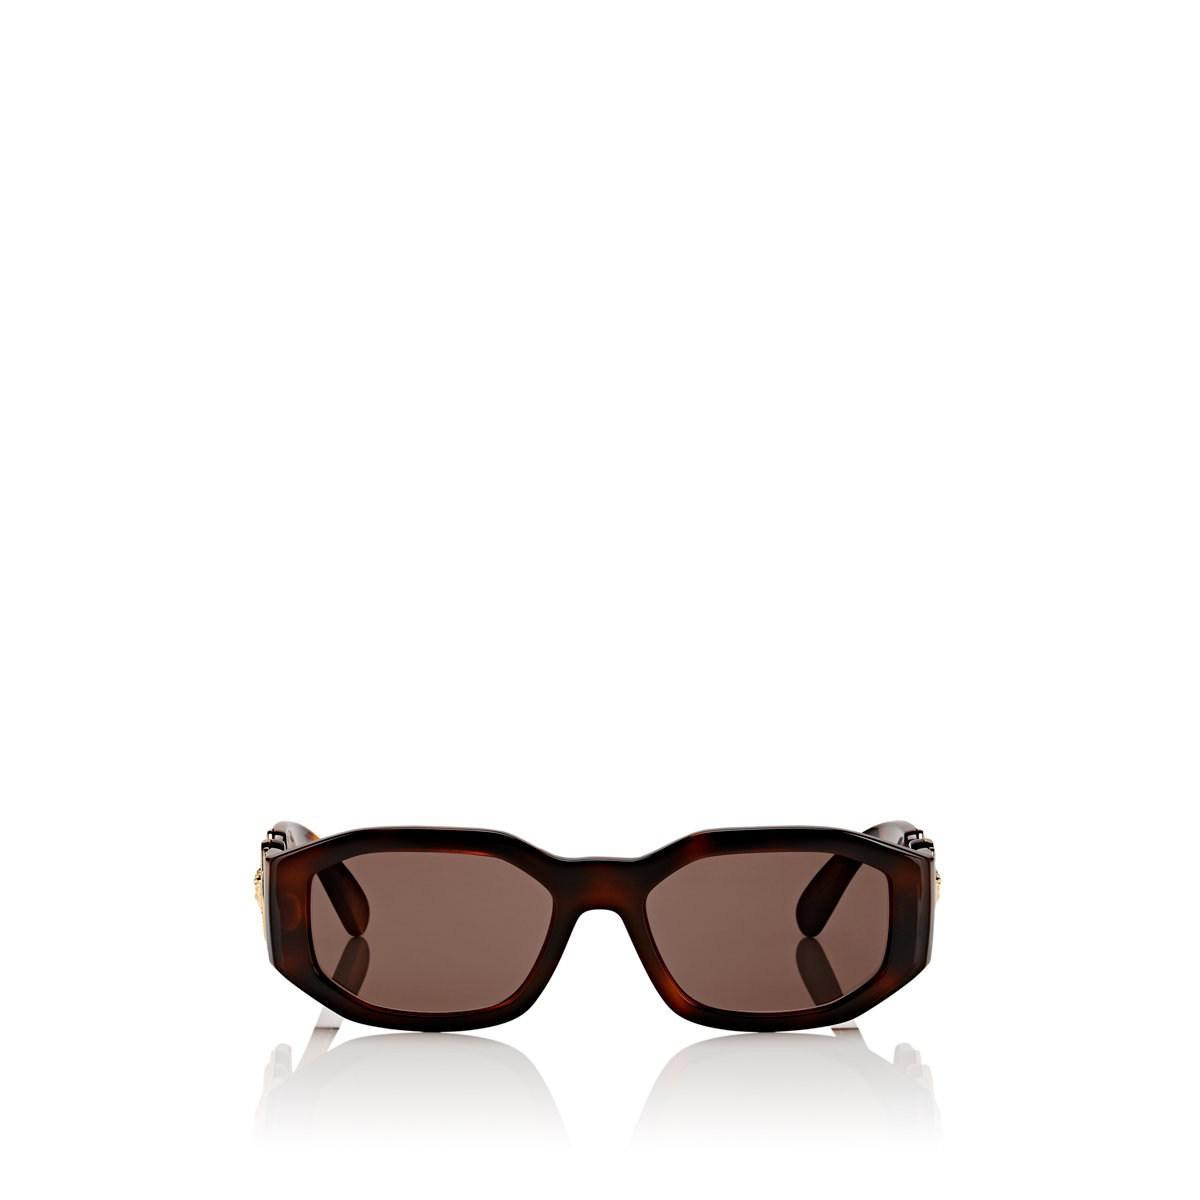 cd37f9194fa5 Versace. Women's Ve4361 Sunglasses